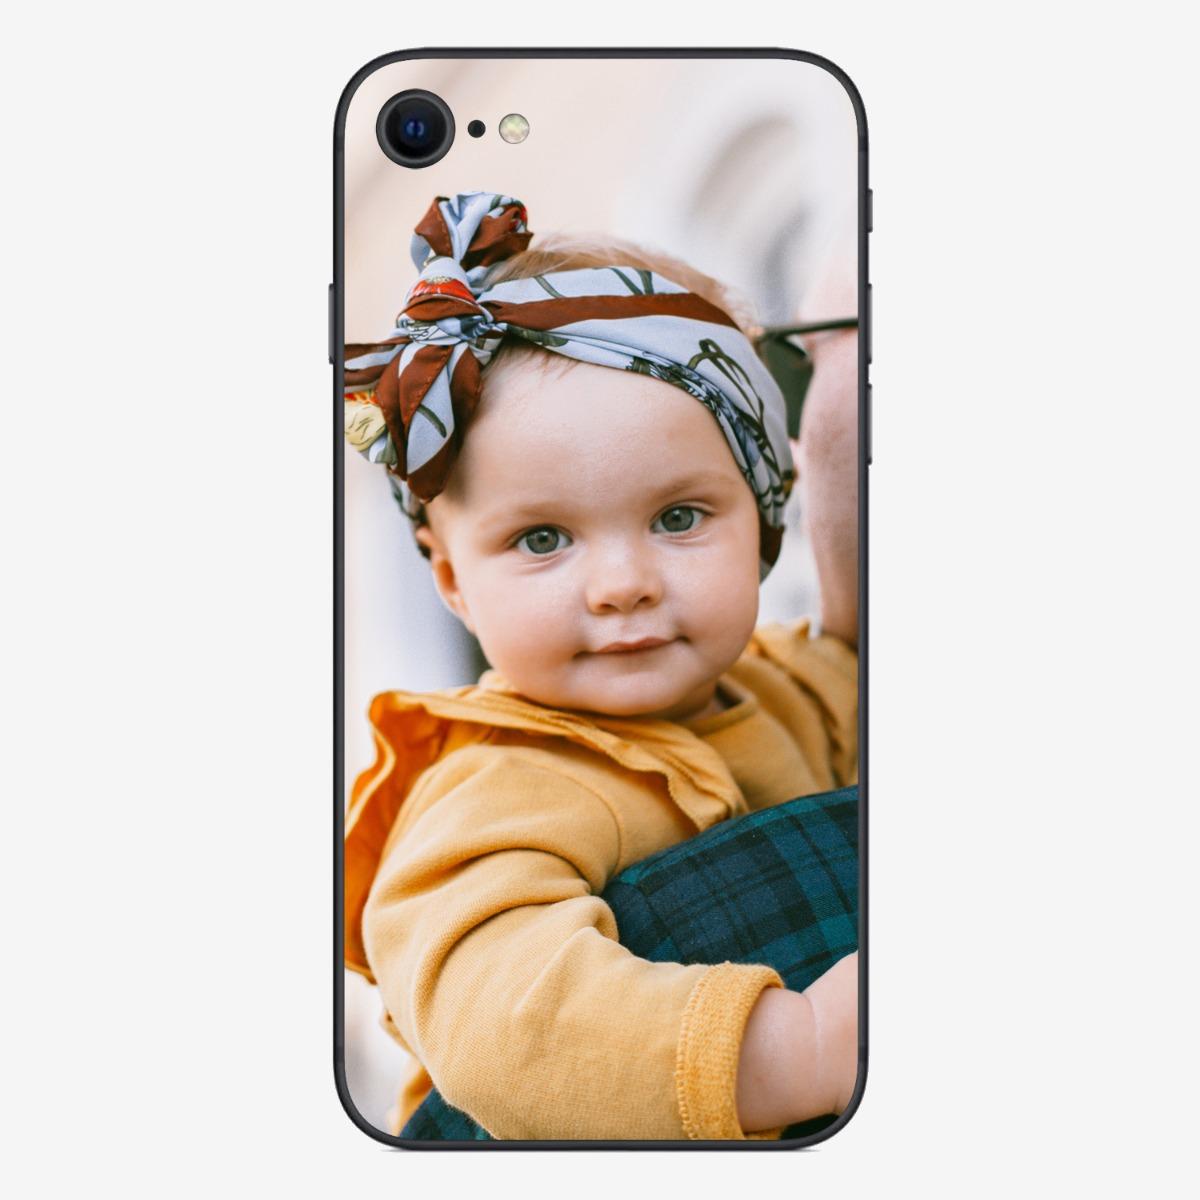 iPhone SE 2020 Skin 16156